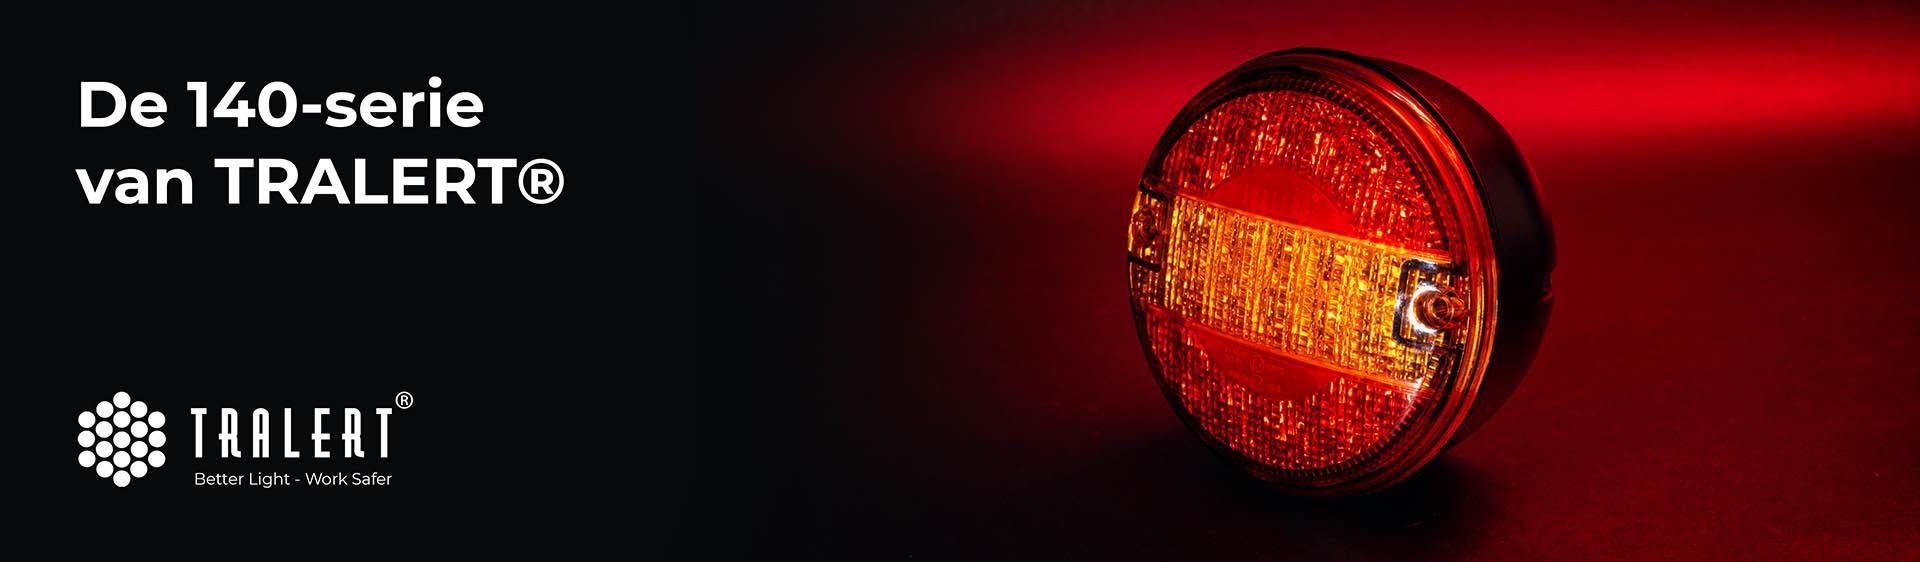 Tralert 140-serie LED achterlicht banner